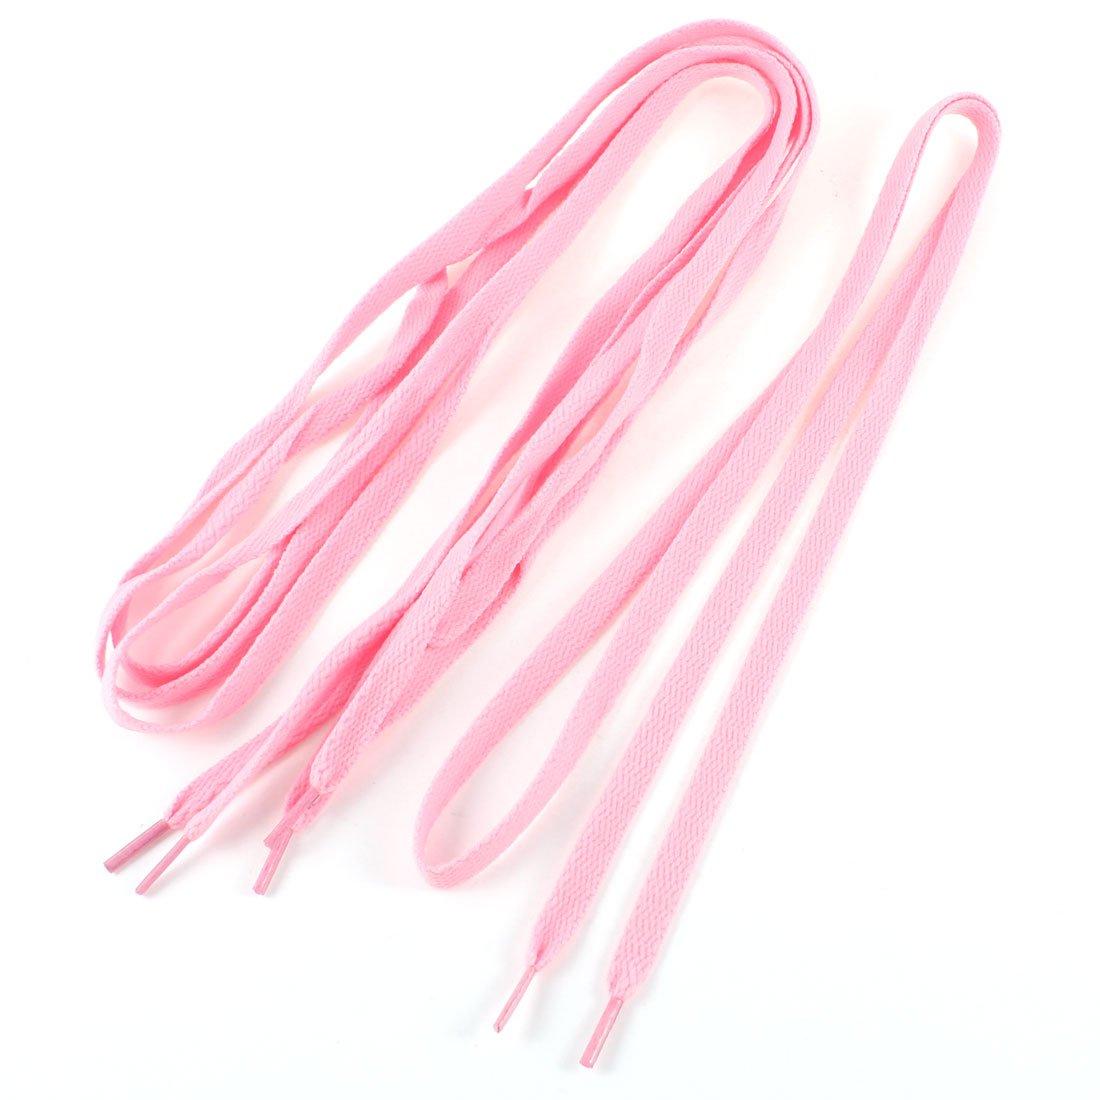 pink flat shoelaces trainer sport boot shoe laces 2